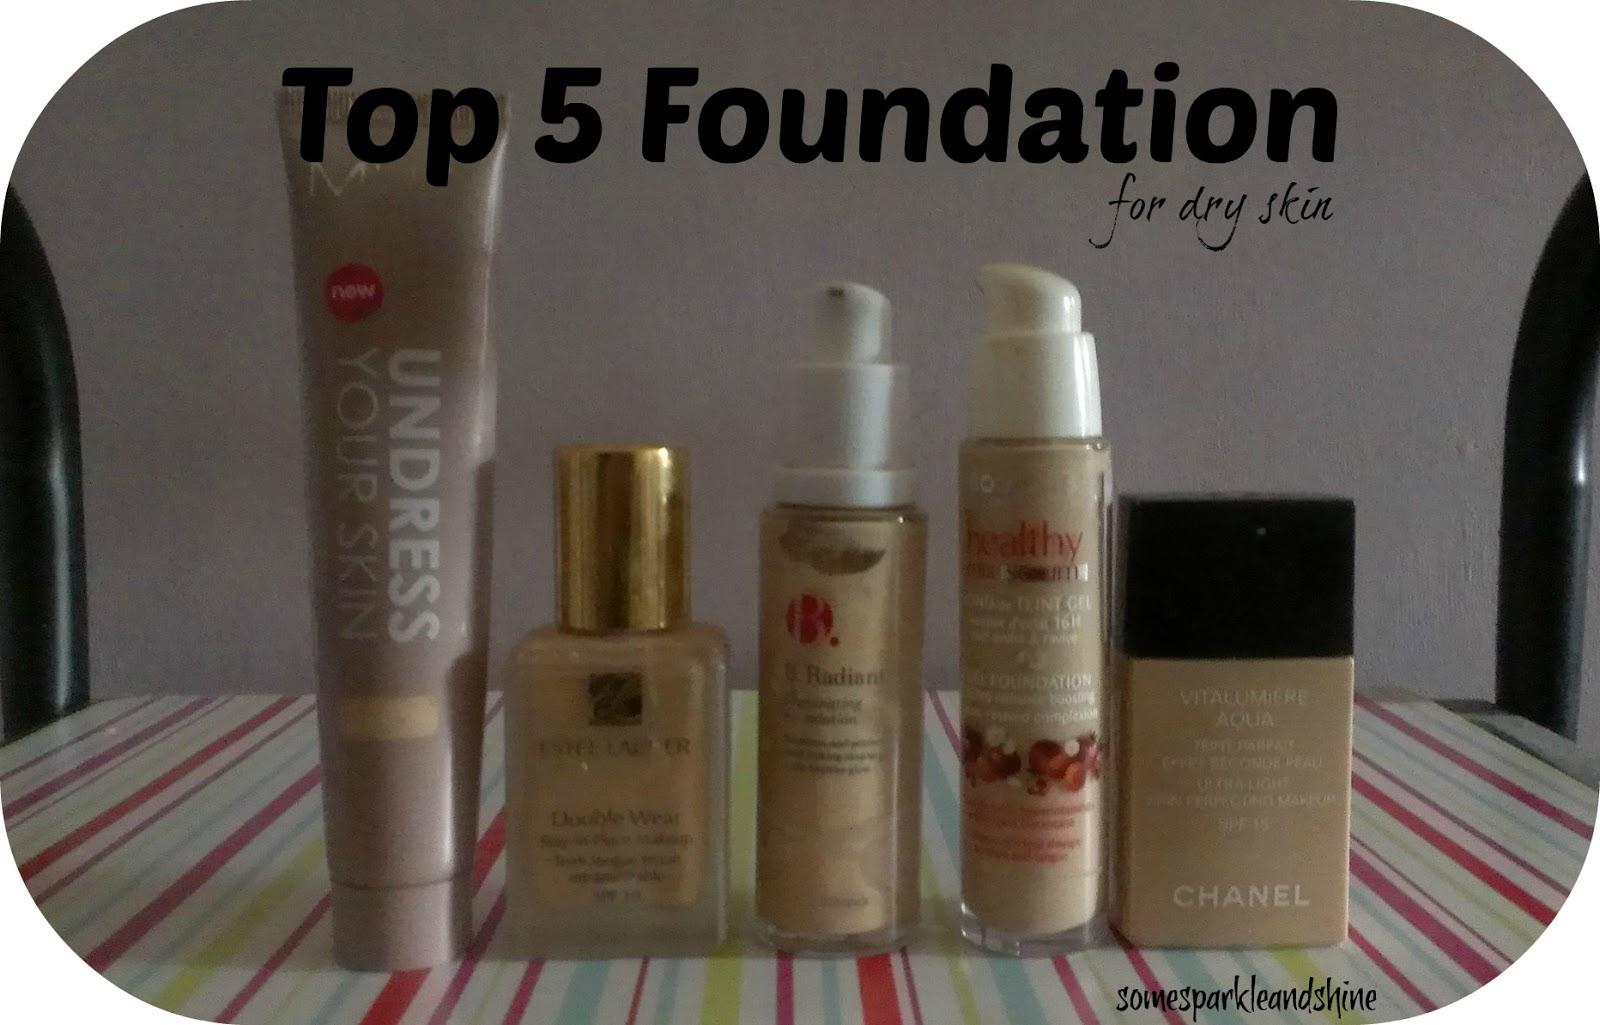 Top 5 Foundations For Dry, Pale Skin: Estee Lauder, MUA